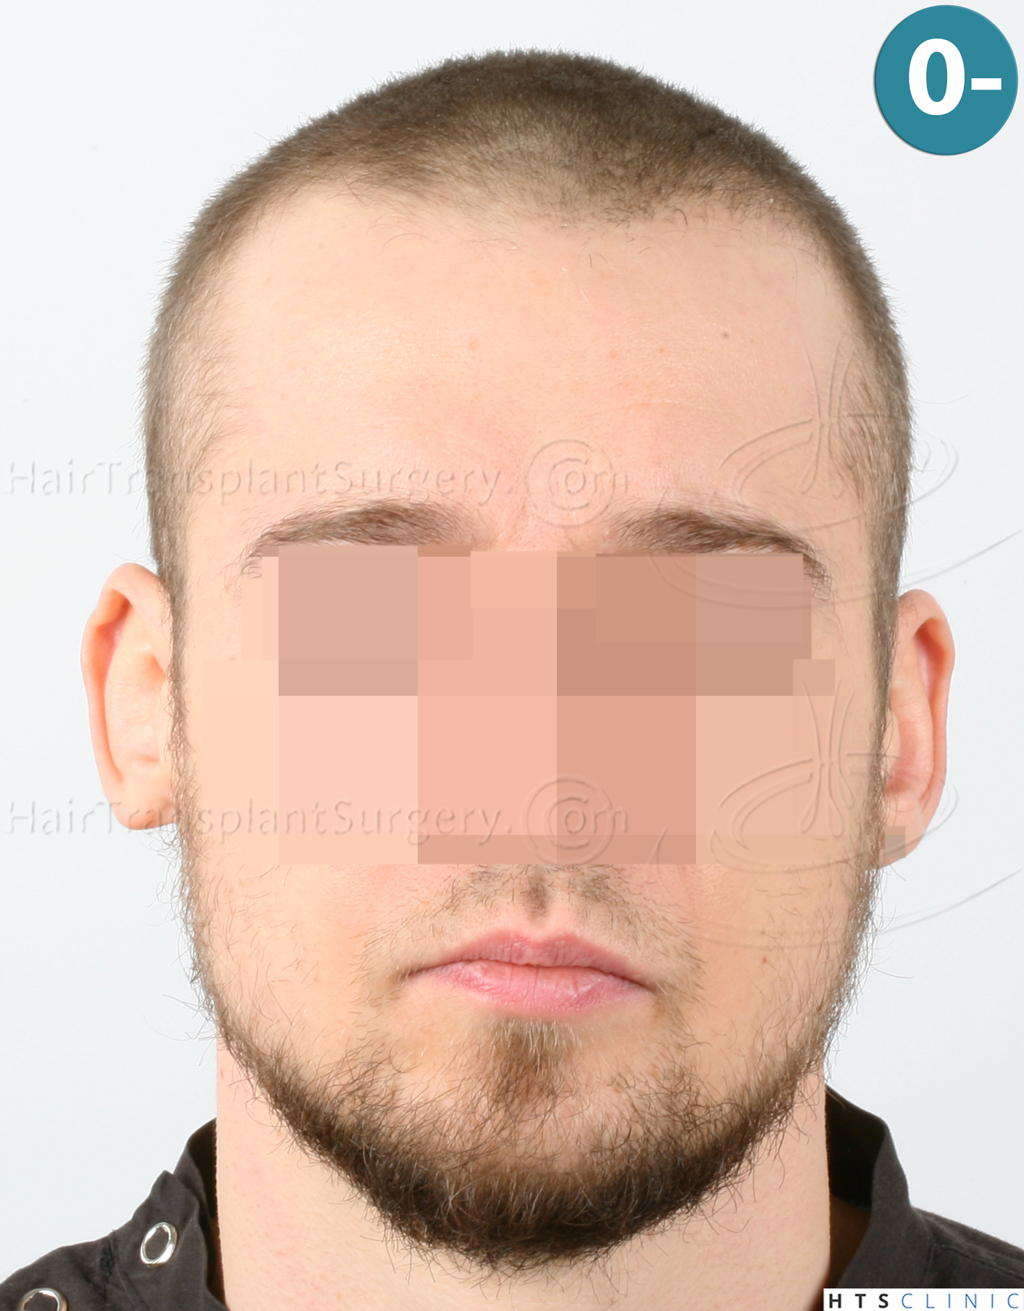 Dr.Devroye-HTS-Clinic-6132-_2011_1232_2889_-FUE-Barbe-et-cheveux-1.jpg